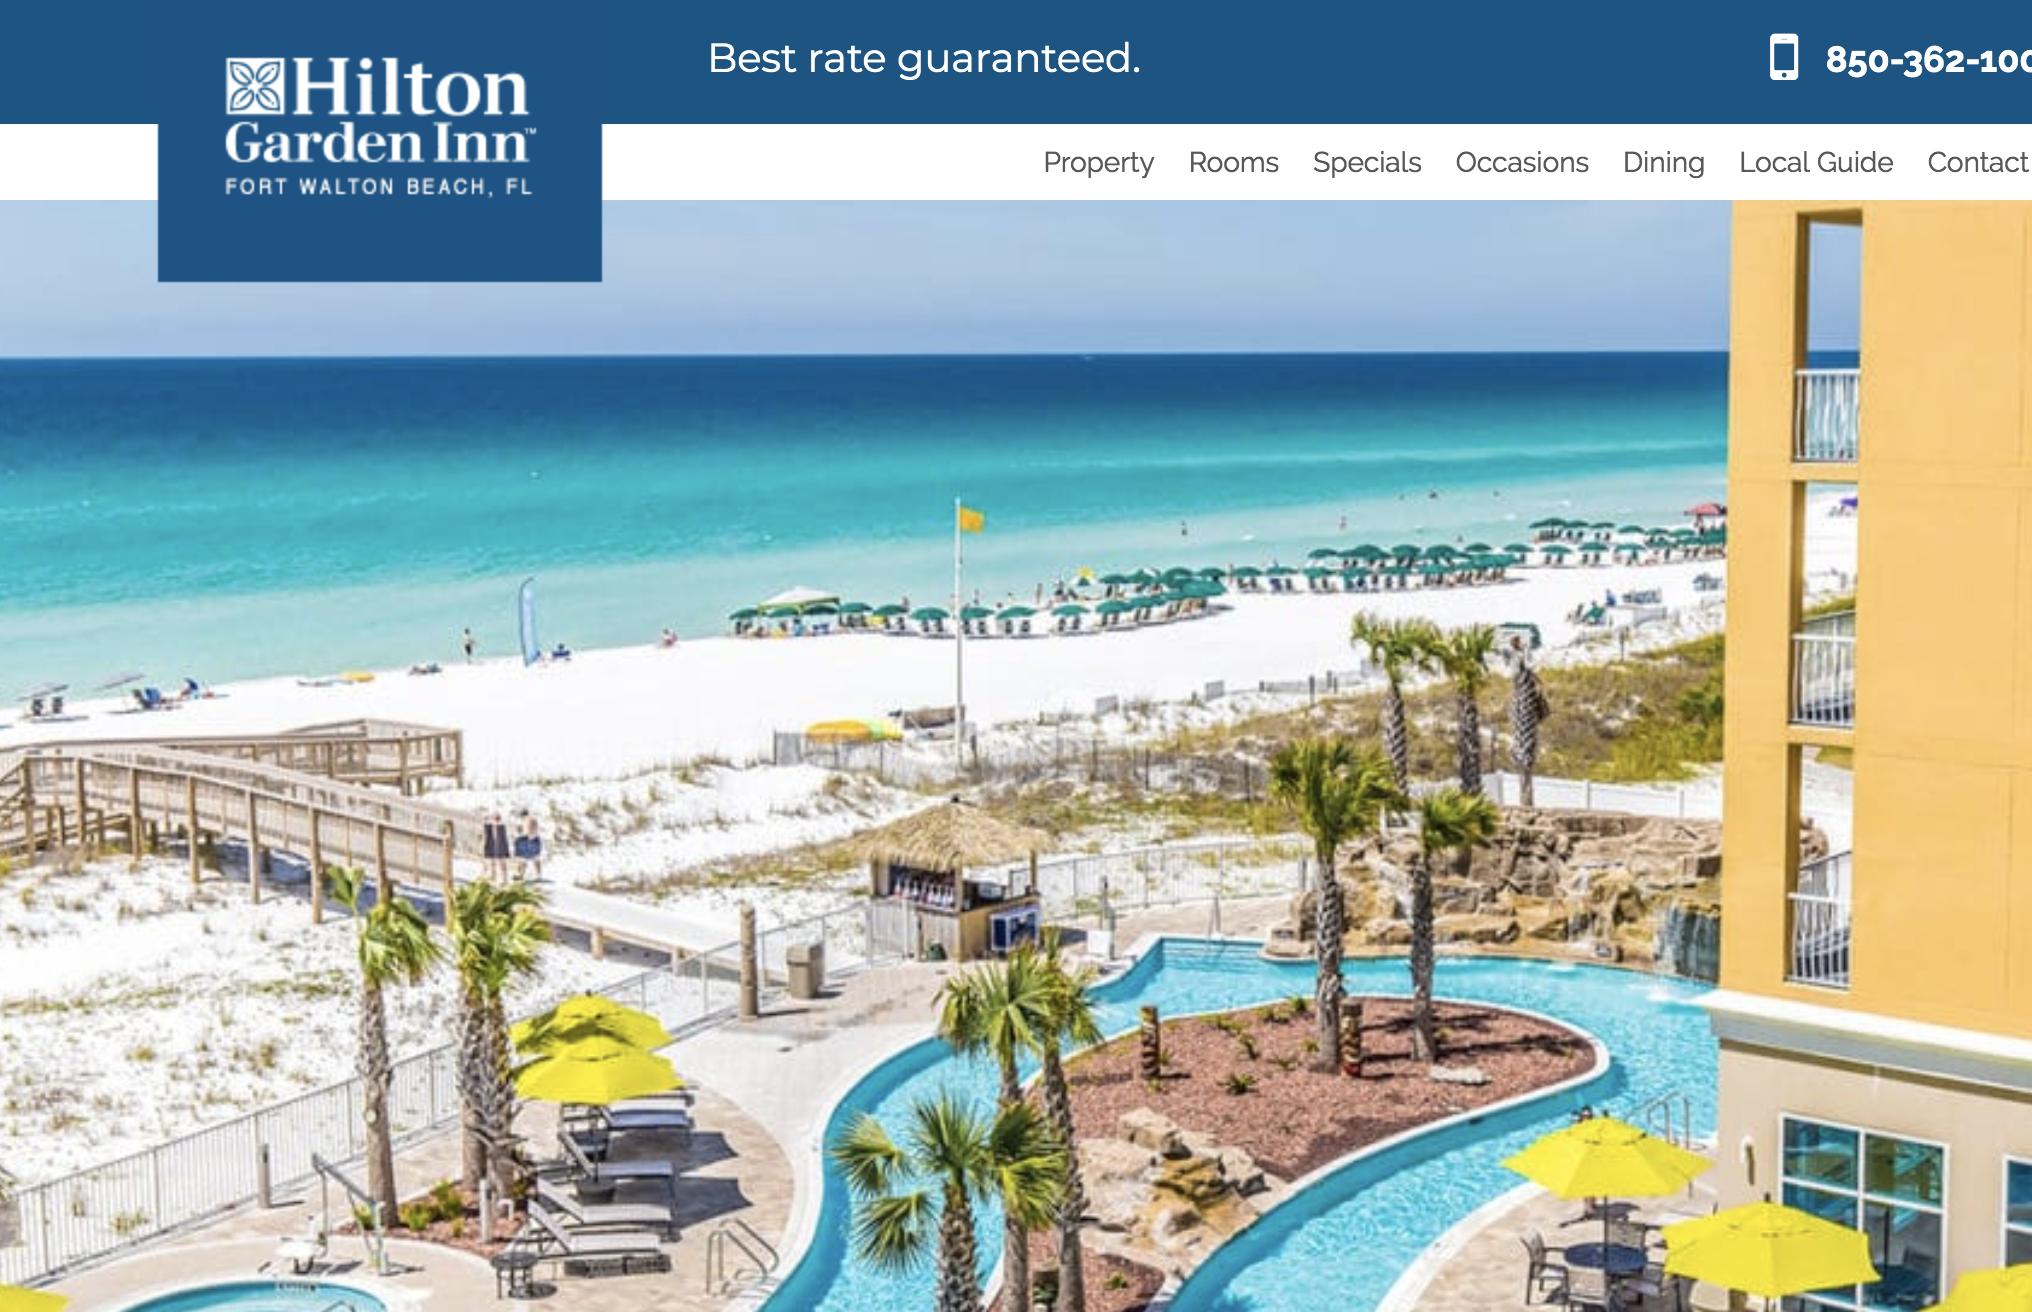 Hilton Garden Inn Ft Walton Beach Fl Fort Walton Beach Hotels Fort Walton Beach Travel Destinations Beach